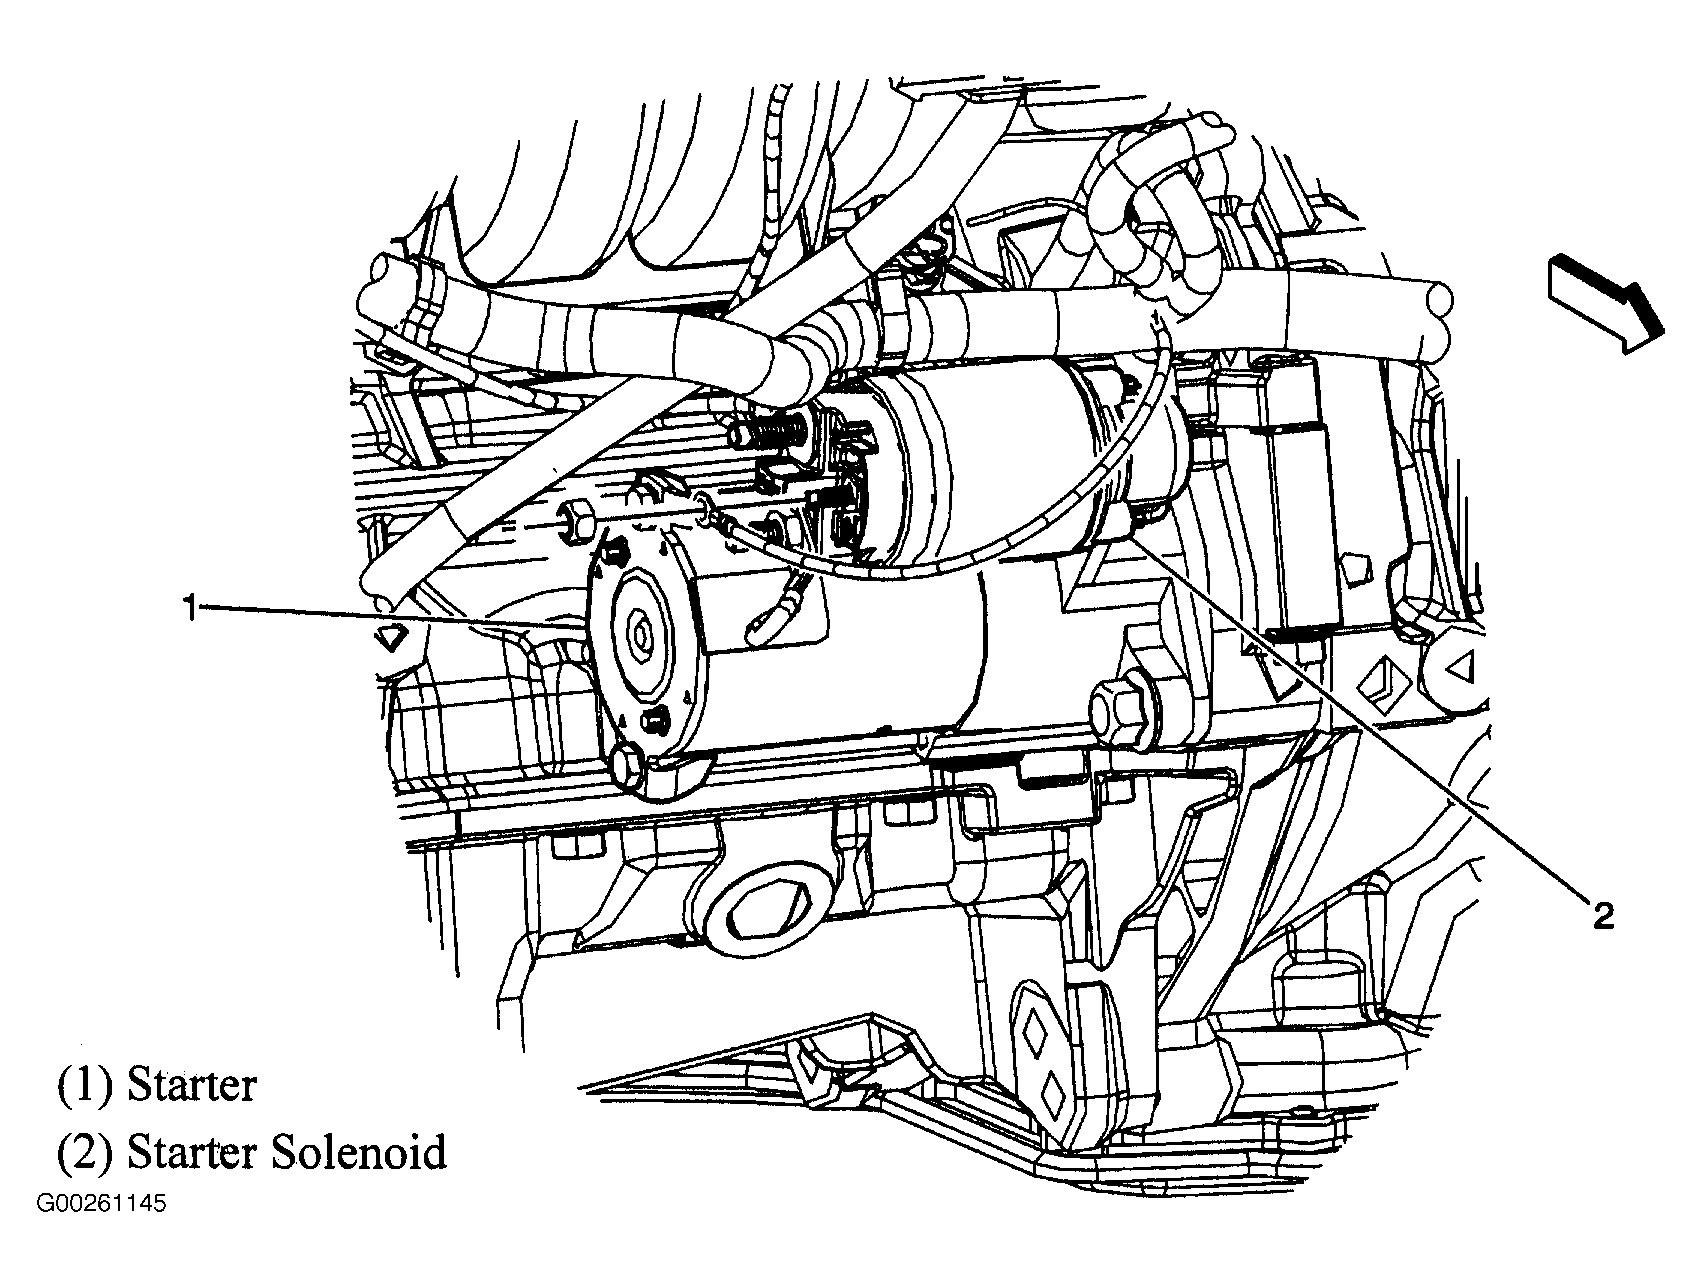 Ecotec 2.2 Engine Oil Circulation System Diagram Diagram] 2012 Chevy Malibu Engine Diagram Full Version Hd Of Ecotec 2.2 Engine Oil Circulation System Diagram